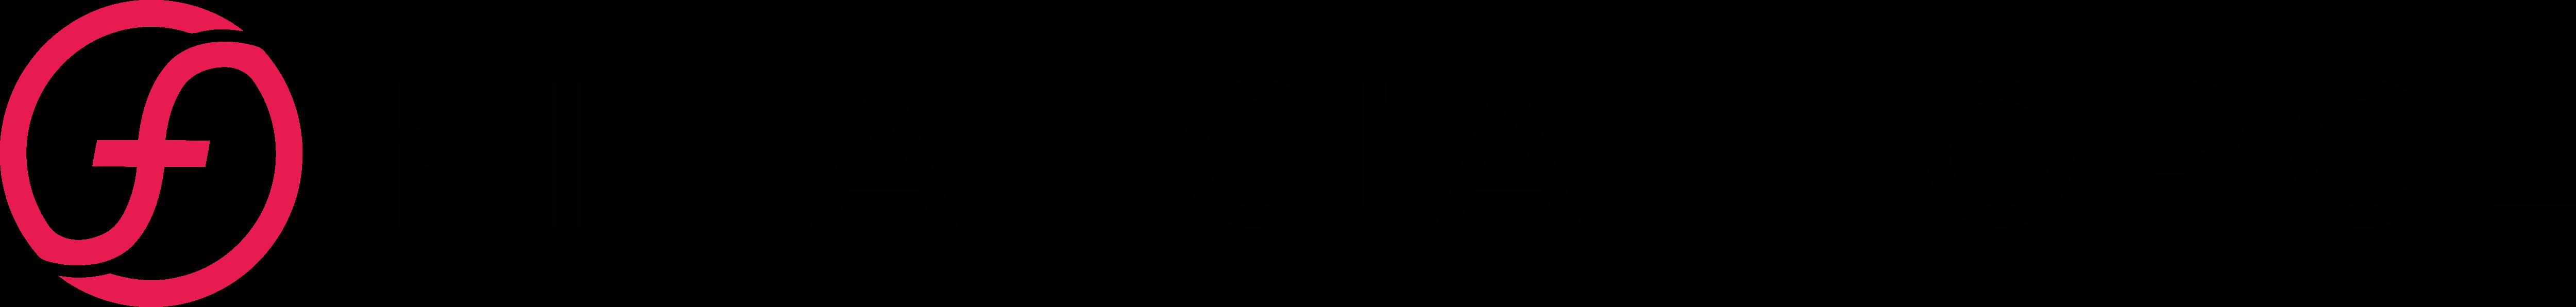 FinancialForce Services Automation logo